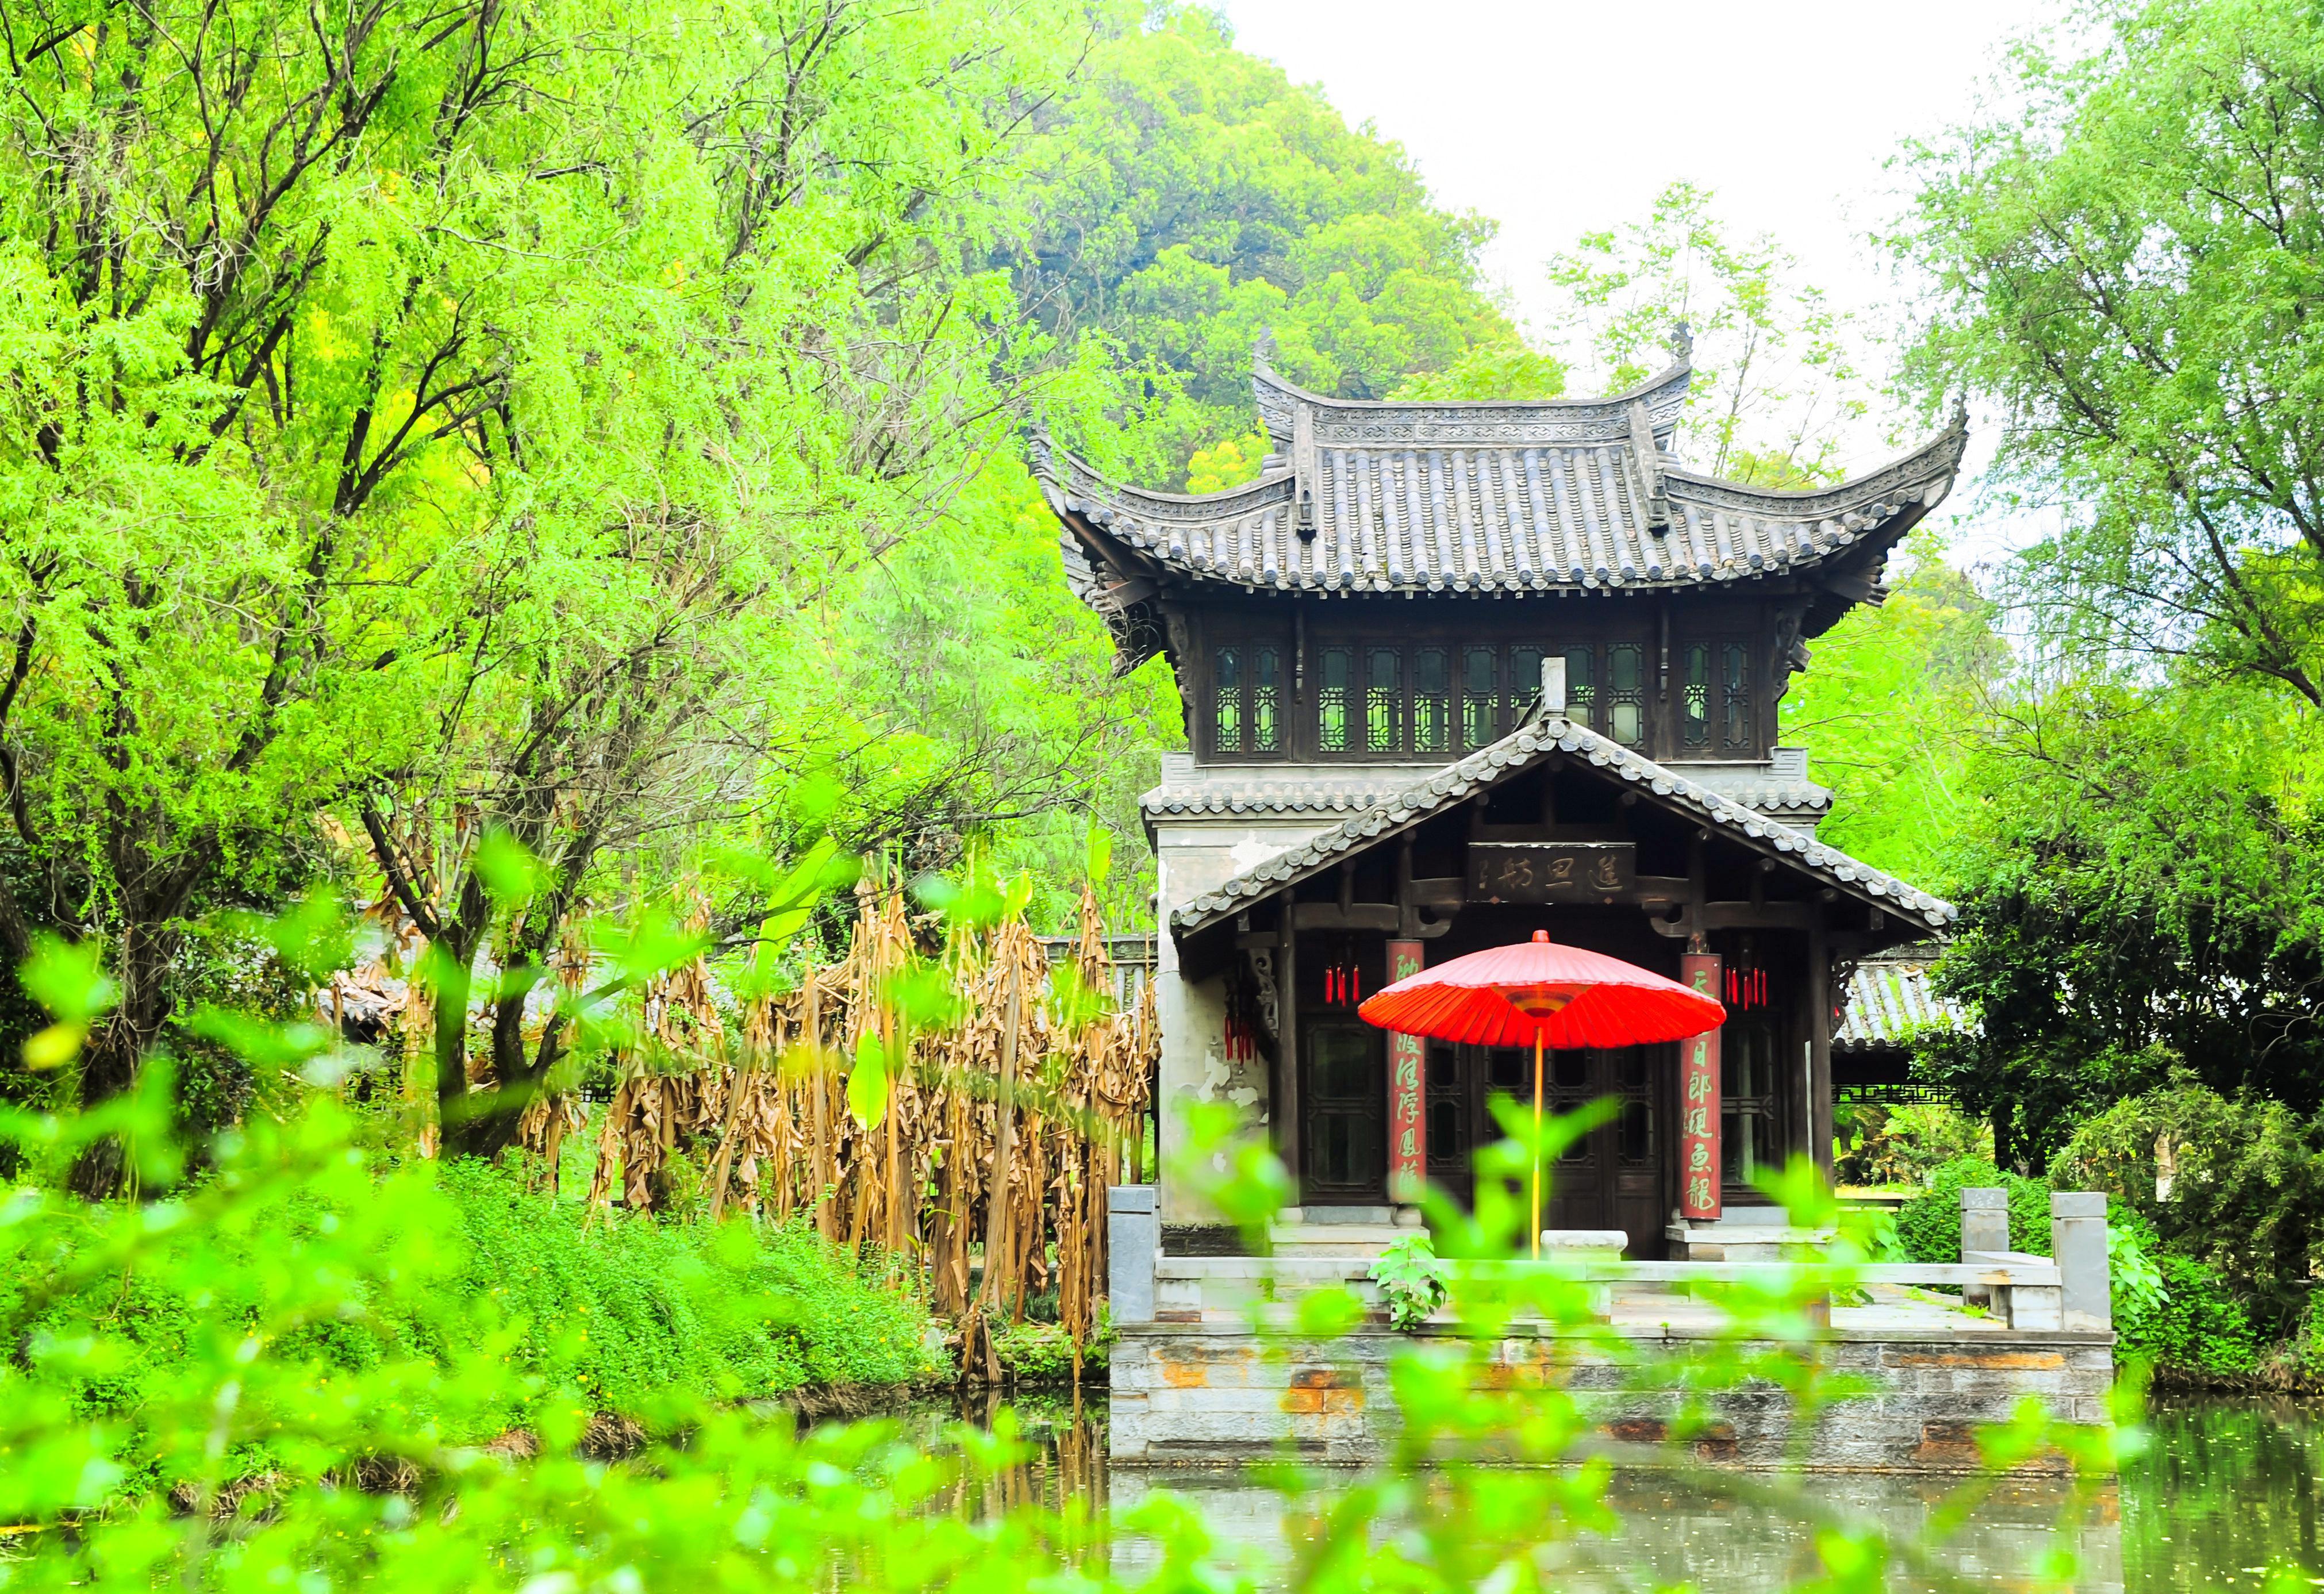 Jiangwan Scenic Spot